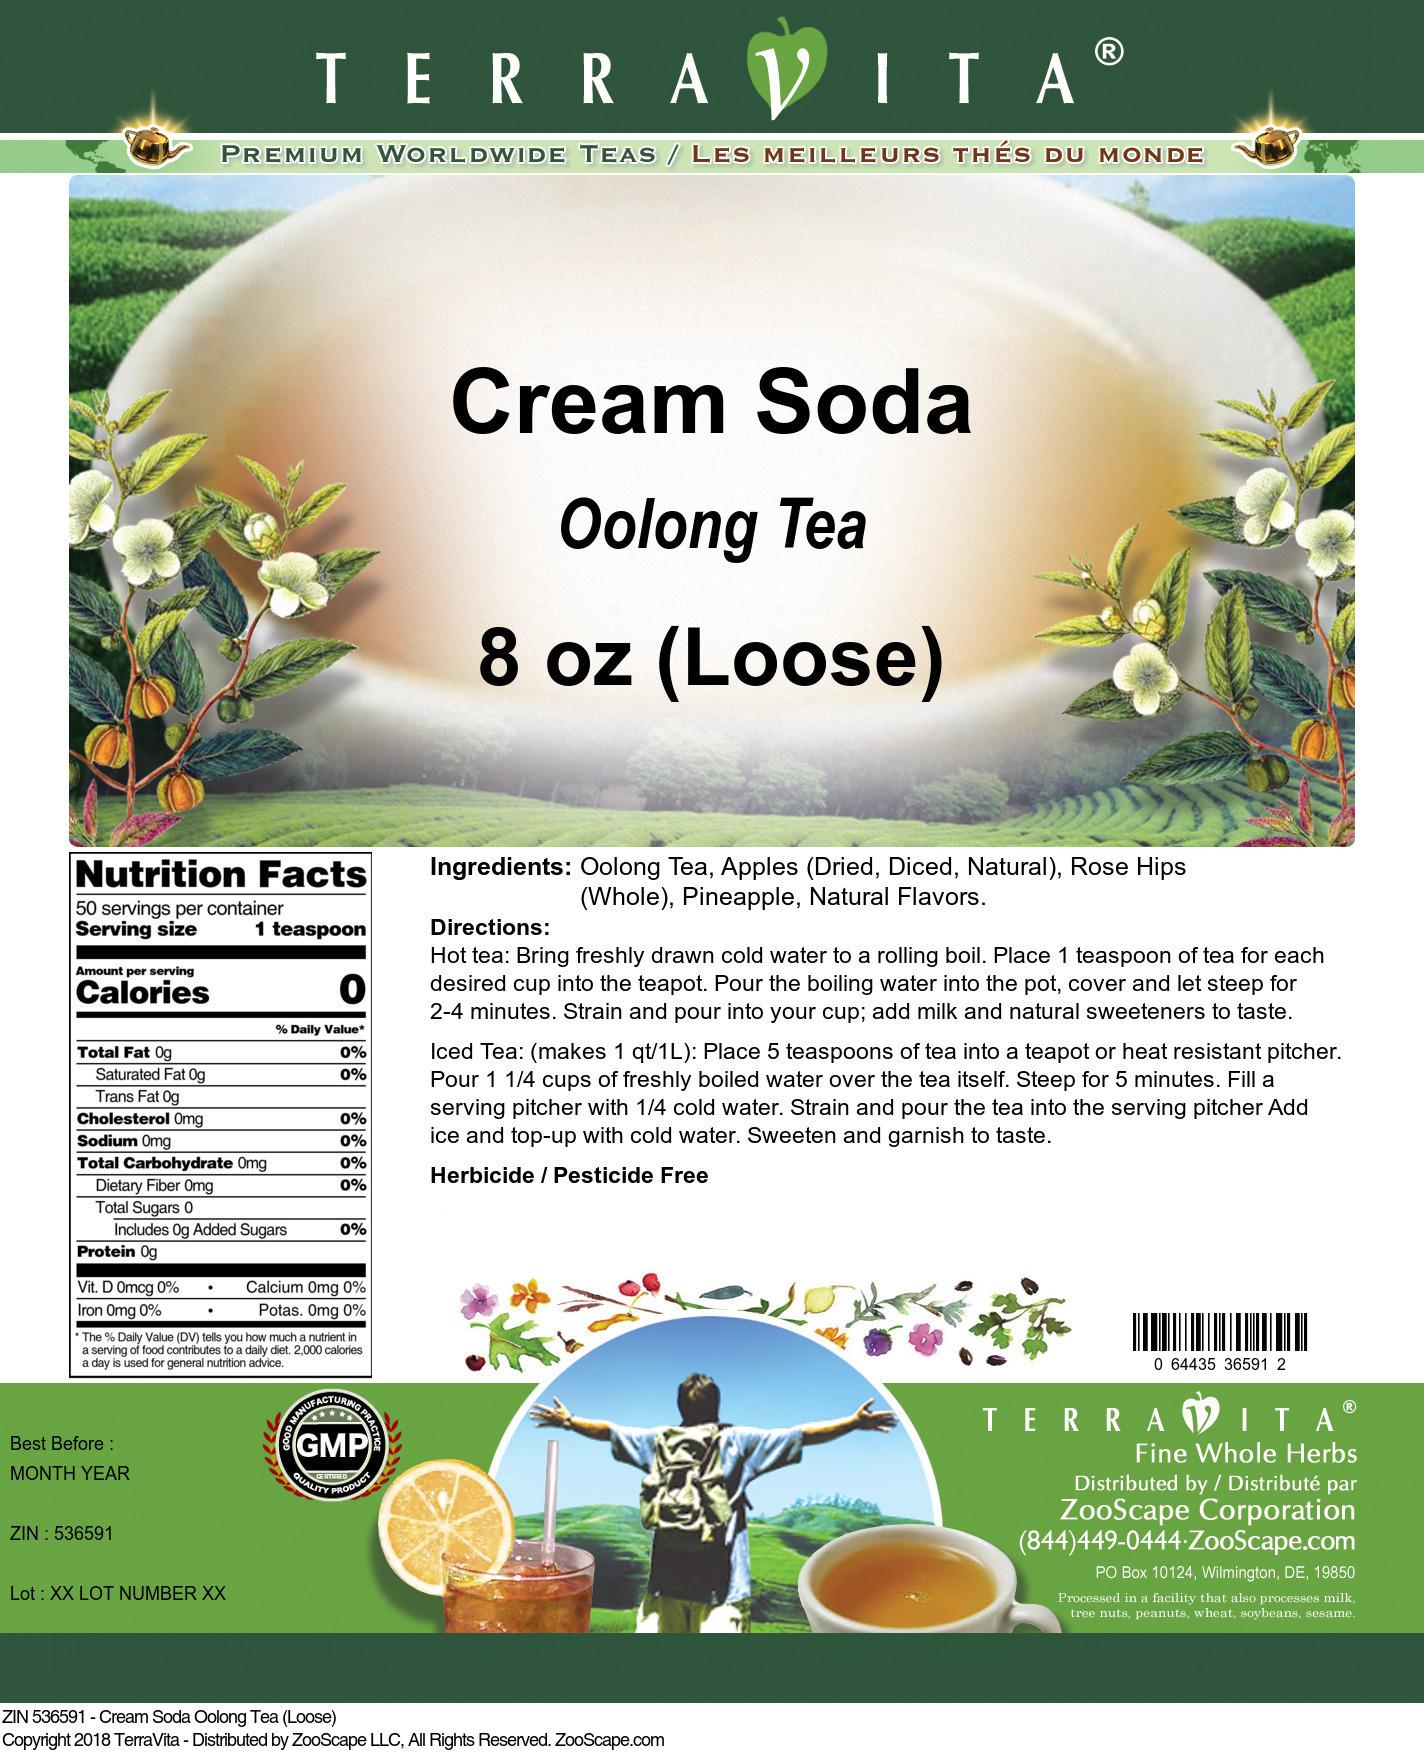 Cream Soda Oolong Tea (Loose)